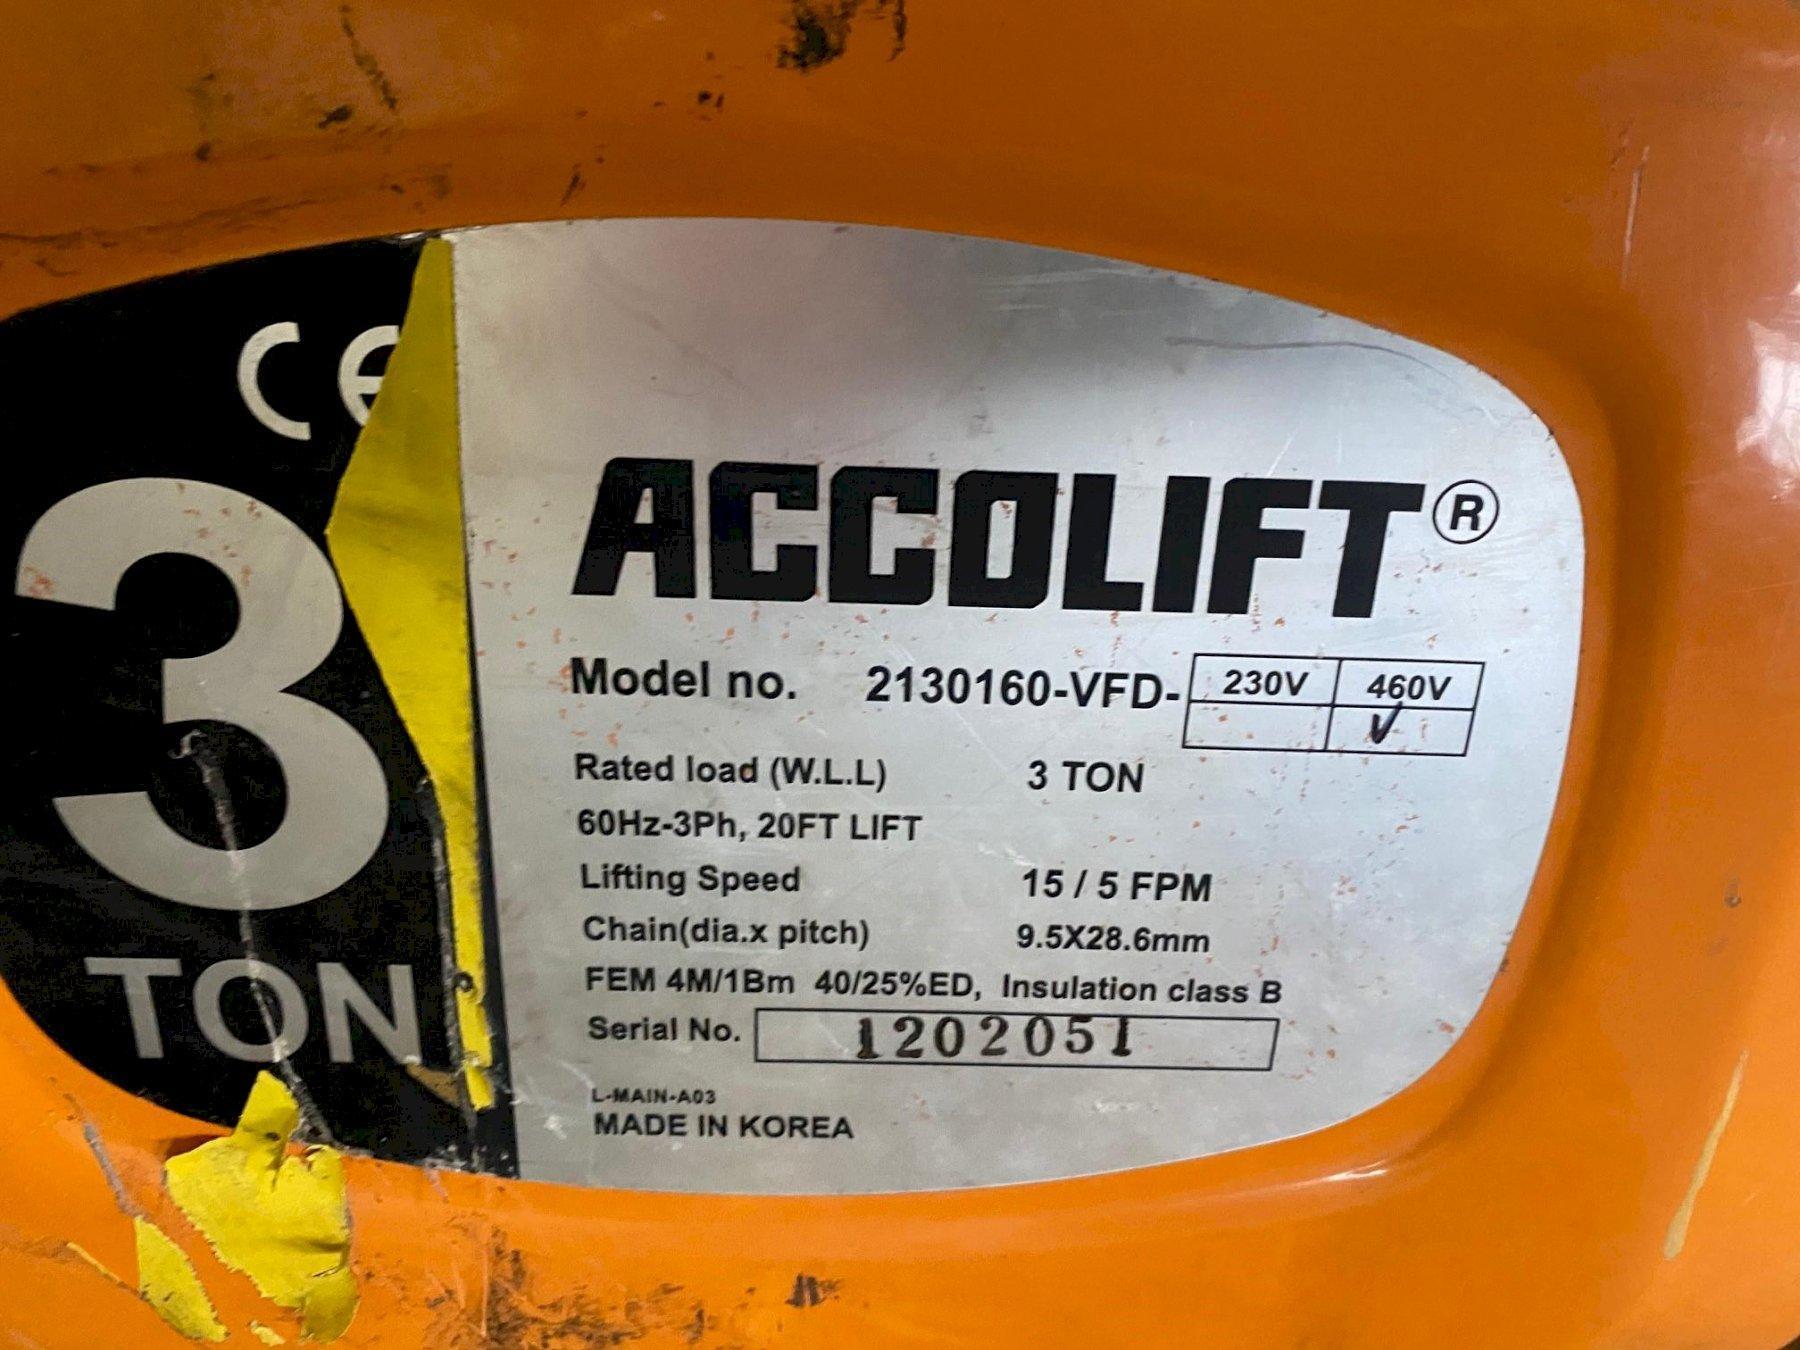 3 Ton Accolift Powered Hoist